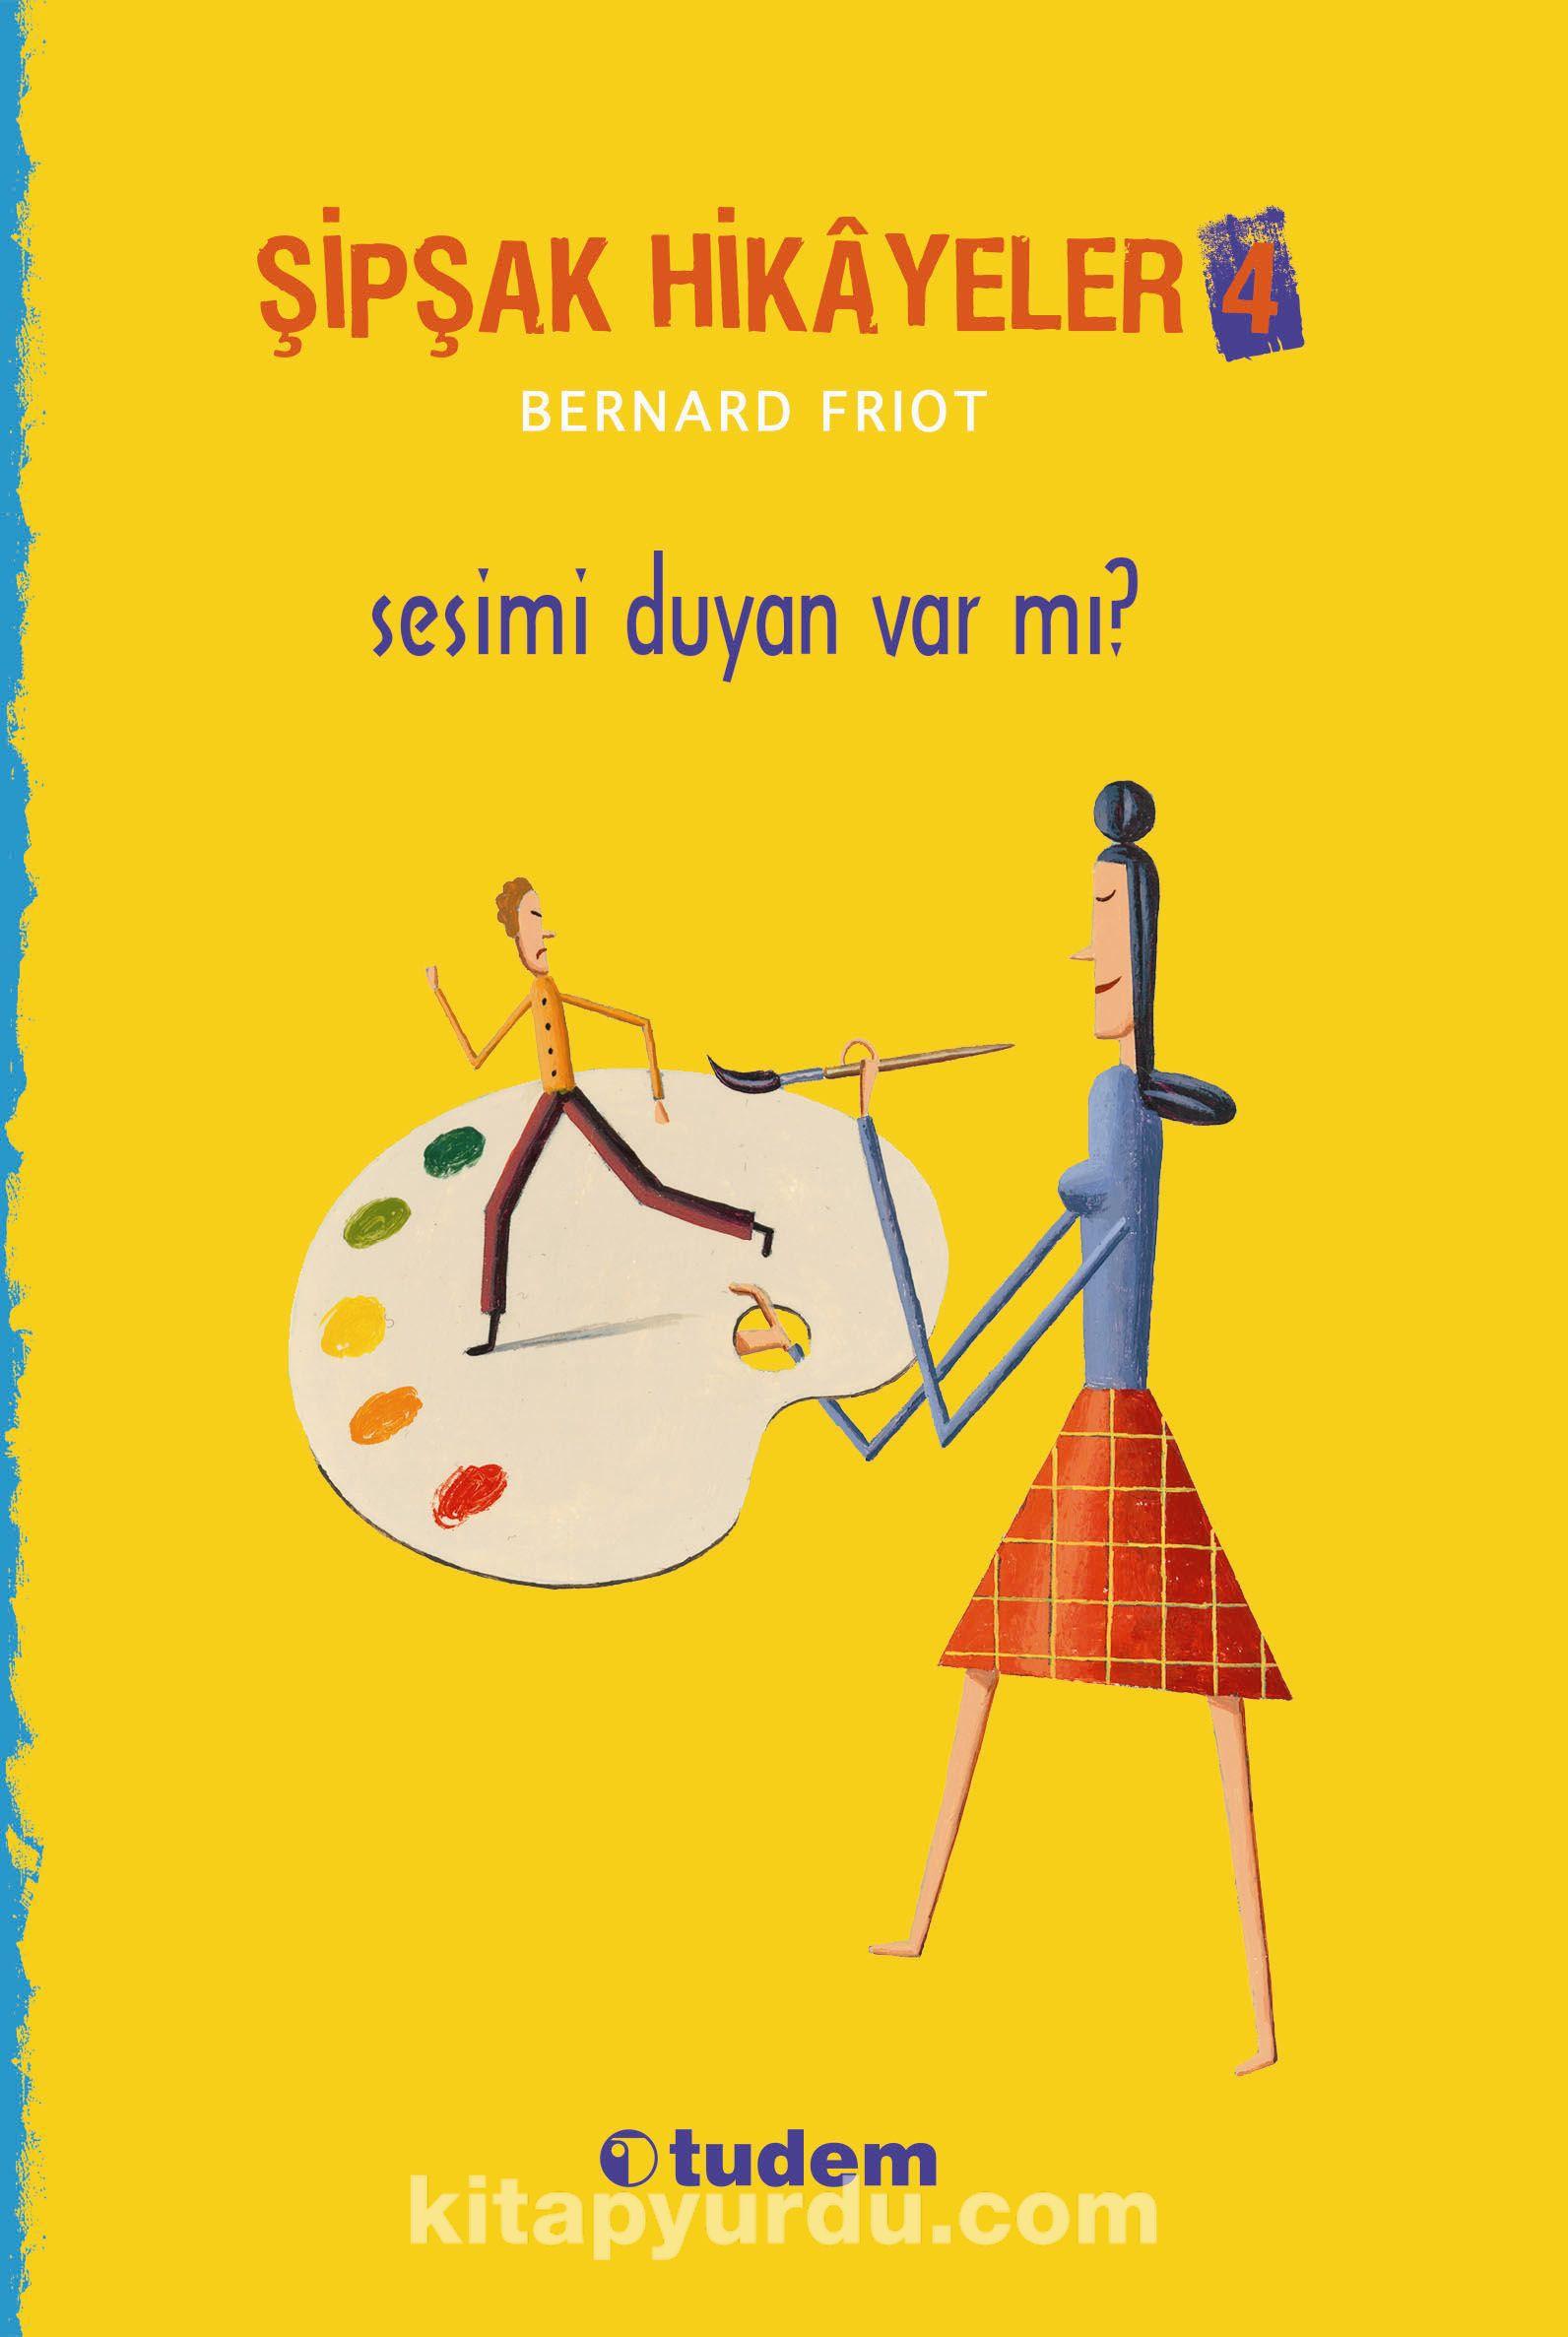 Şipşak Hikayeler 4 / Sesimi Duyan Var mı? - Bernard Friot pdf epub